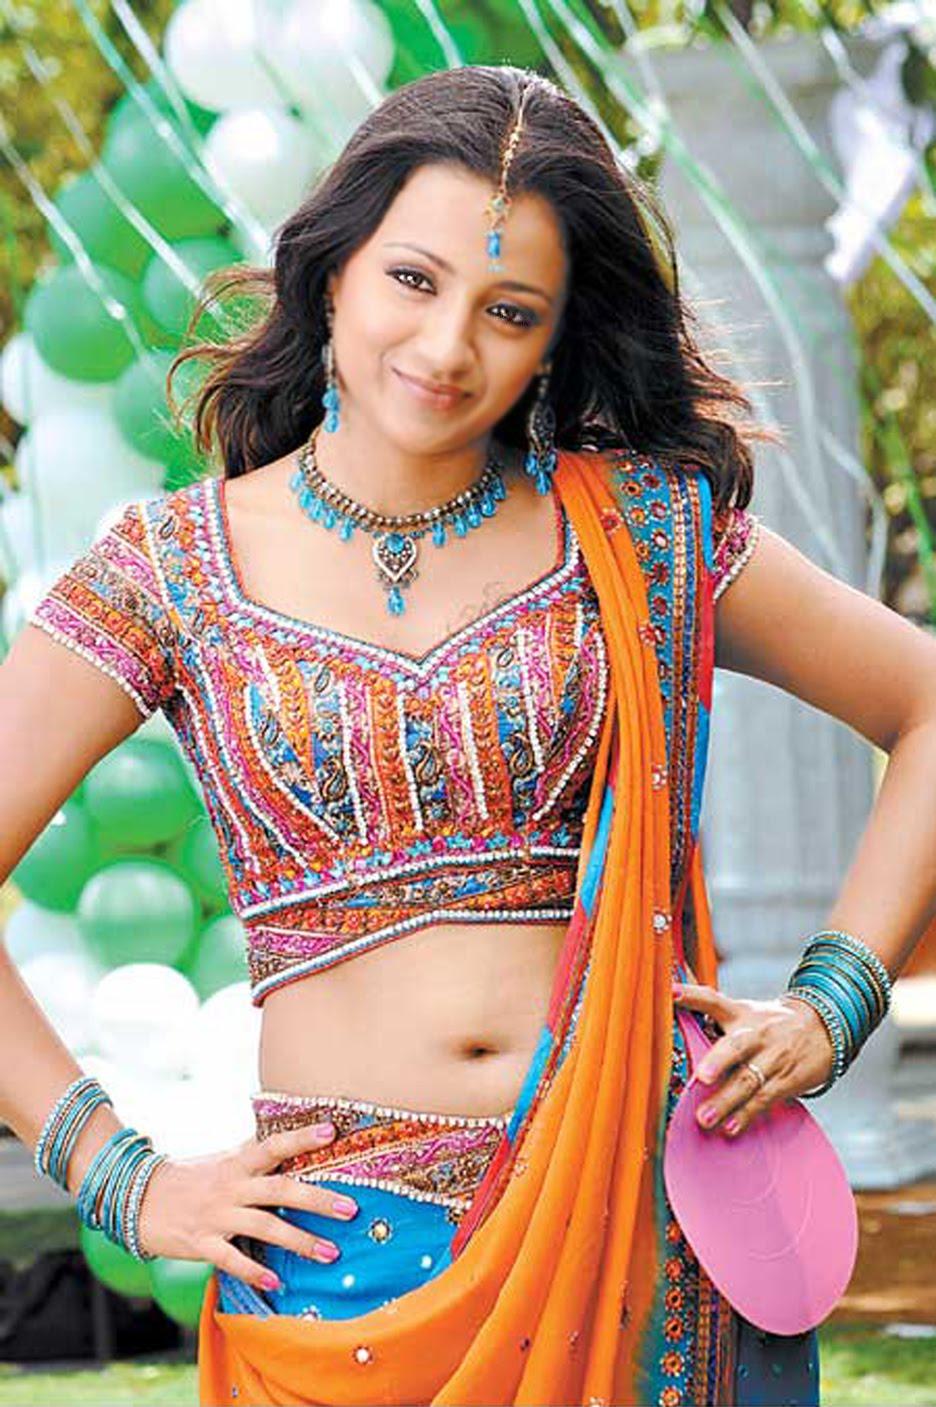 Xxx Hindi Sex Movies  Free Hindi Adult Video Clips